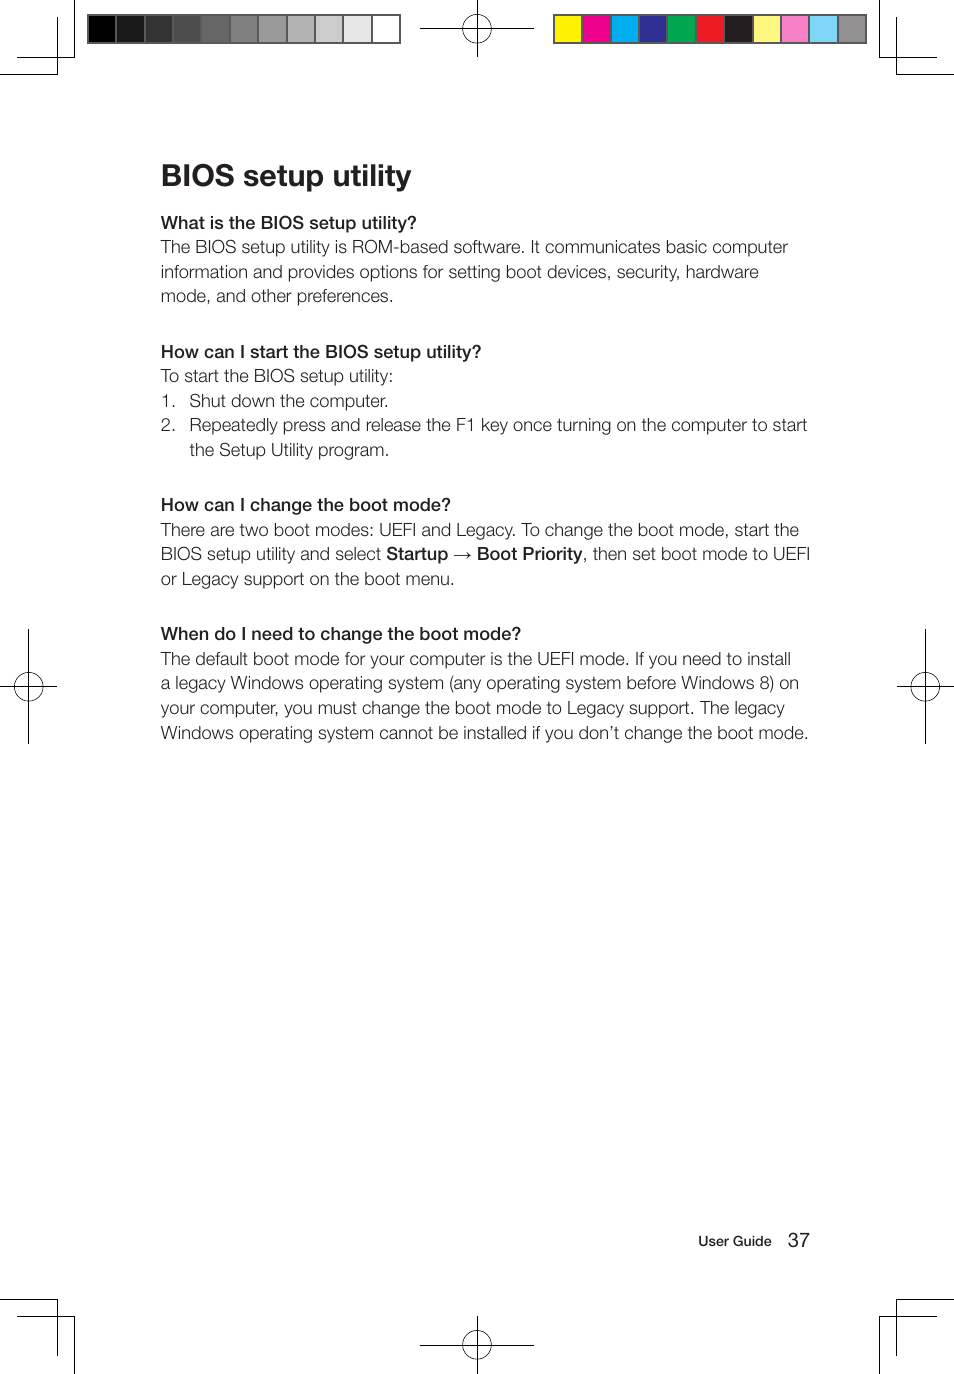 bios setup utility lenovo ideacentre b550 all in one user manual rh manualsdir com User Manual User Manual